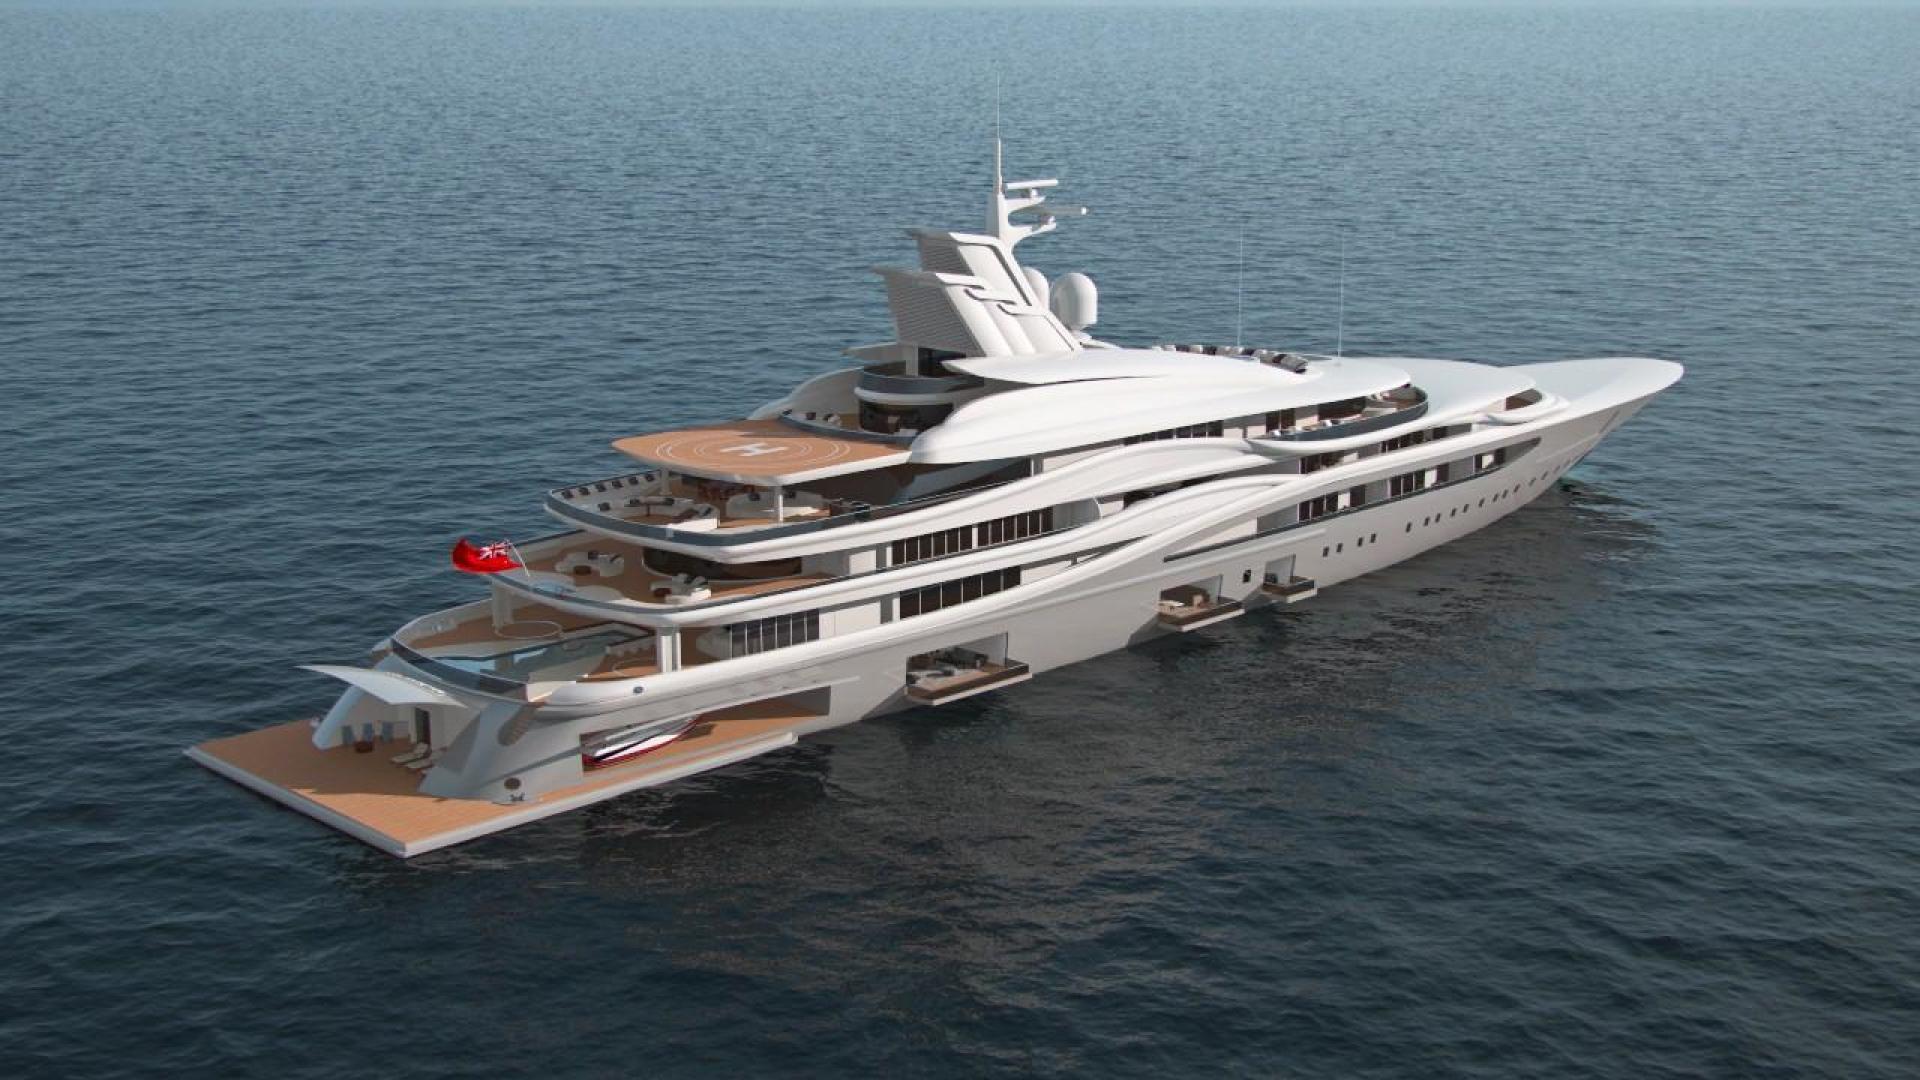 Custom-Project-Odin-2020-Project-Odin-Monaco-Monaco-1034575